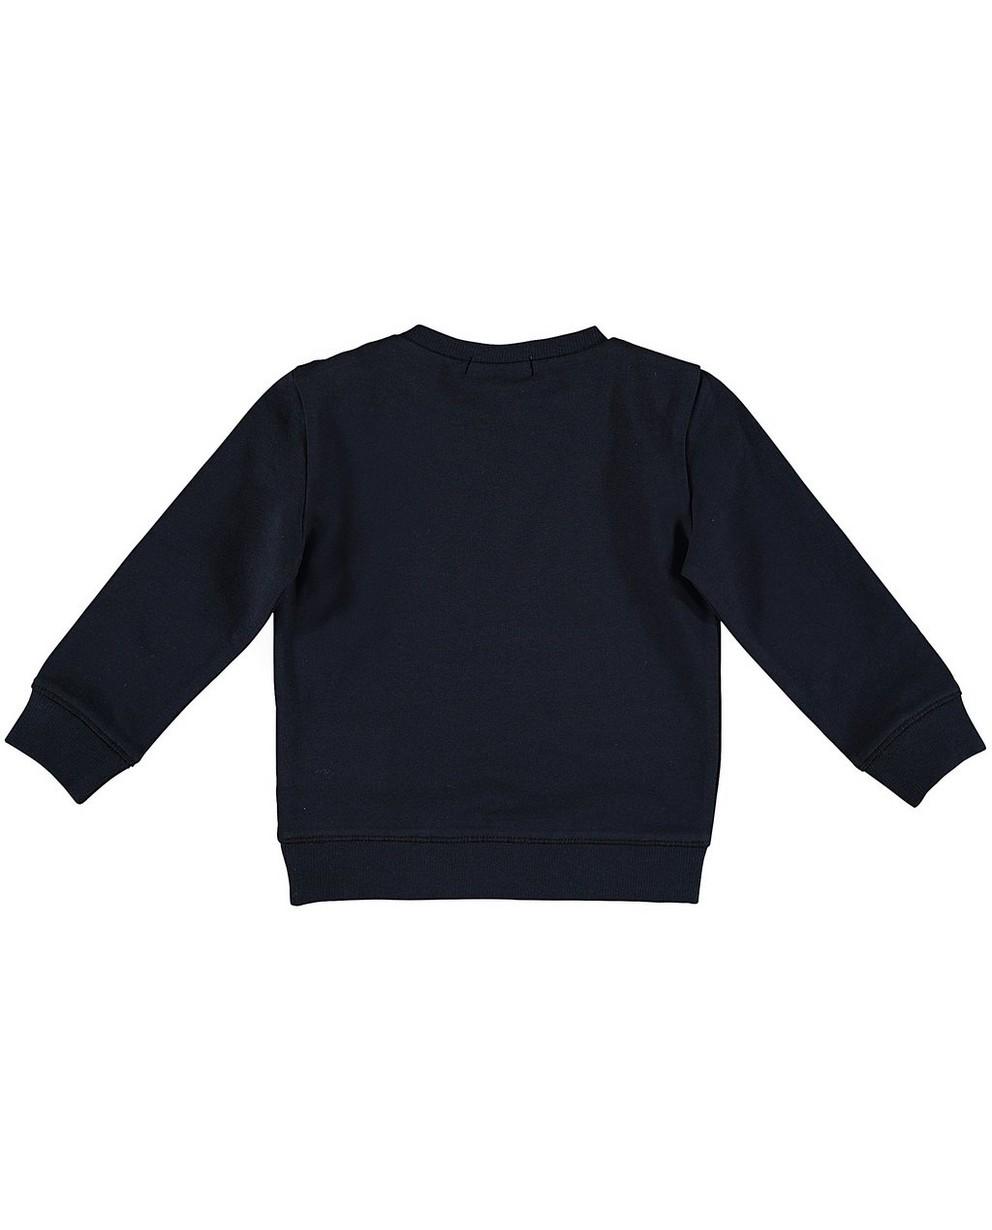 Sweaters - AO4 - sweater met print